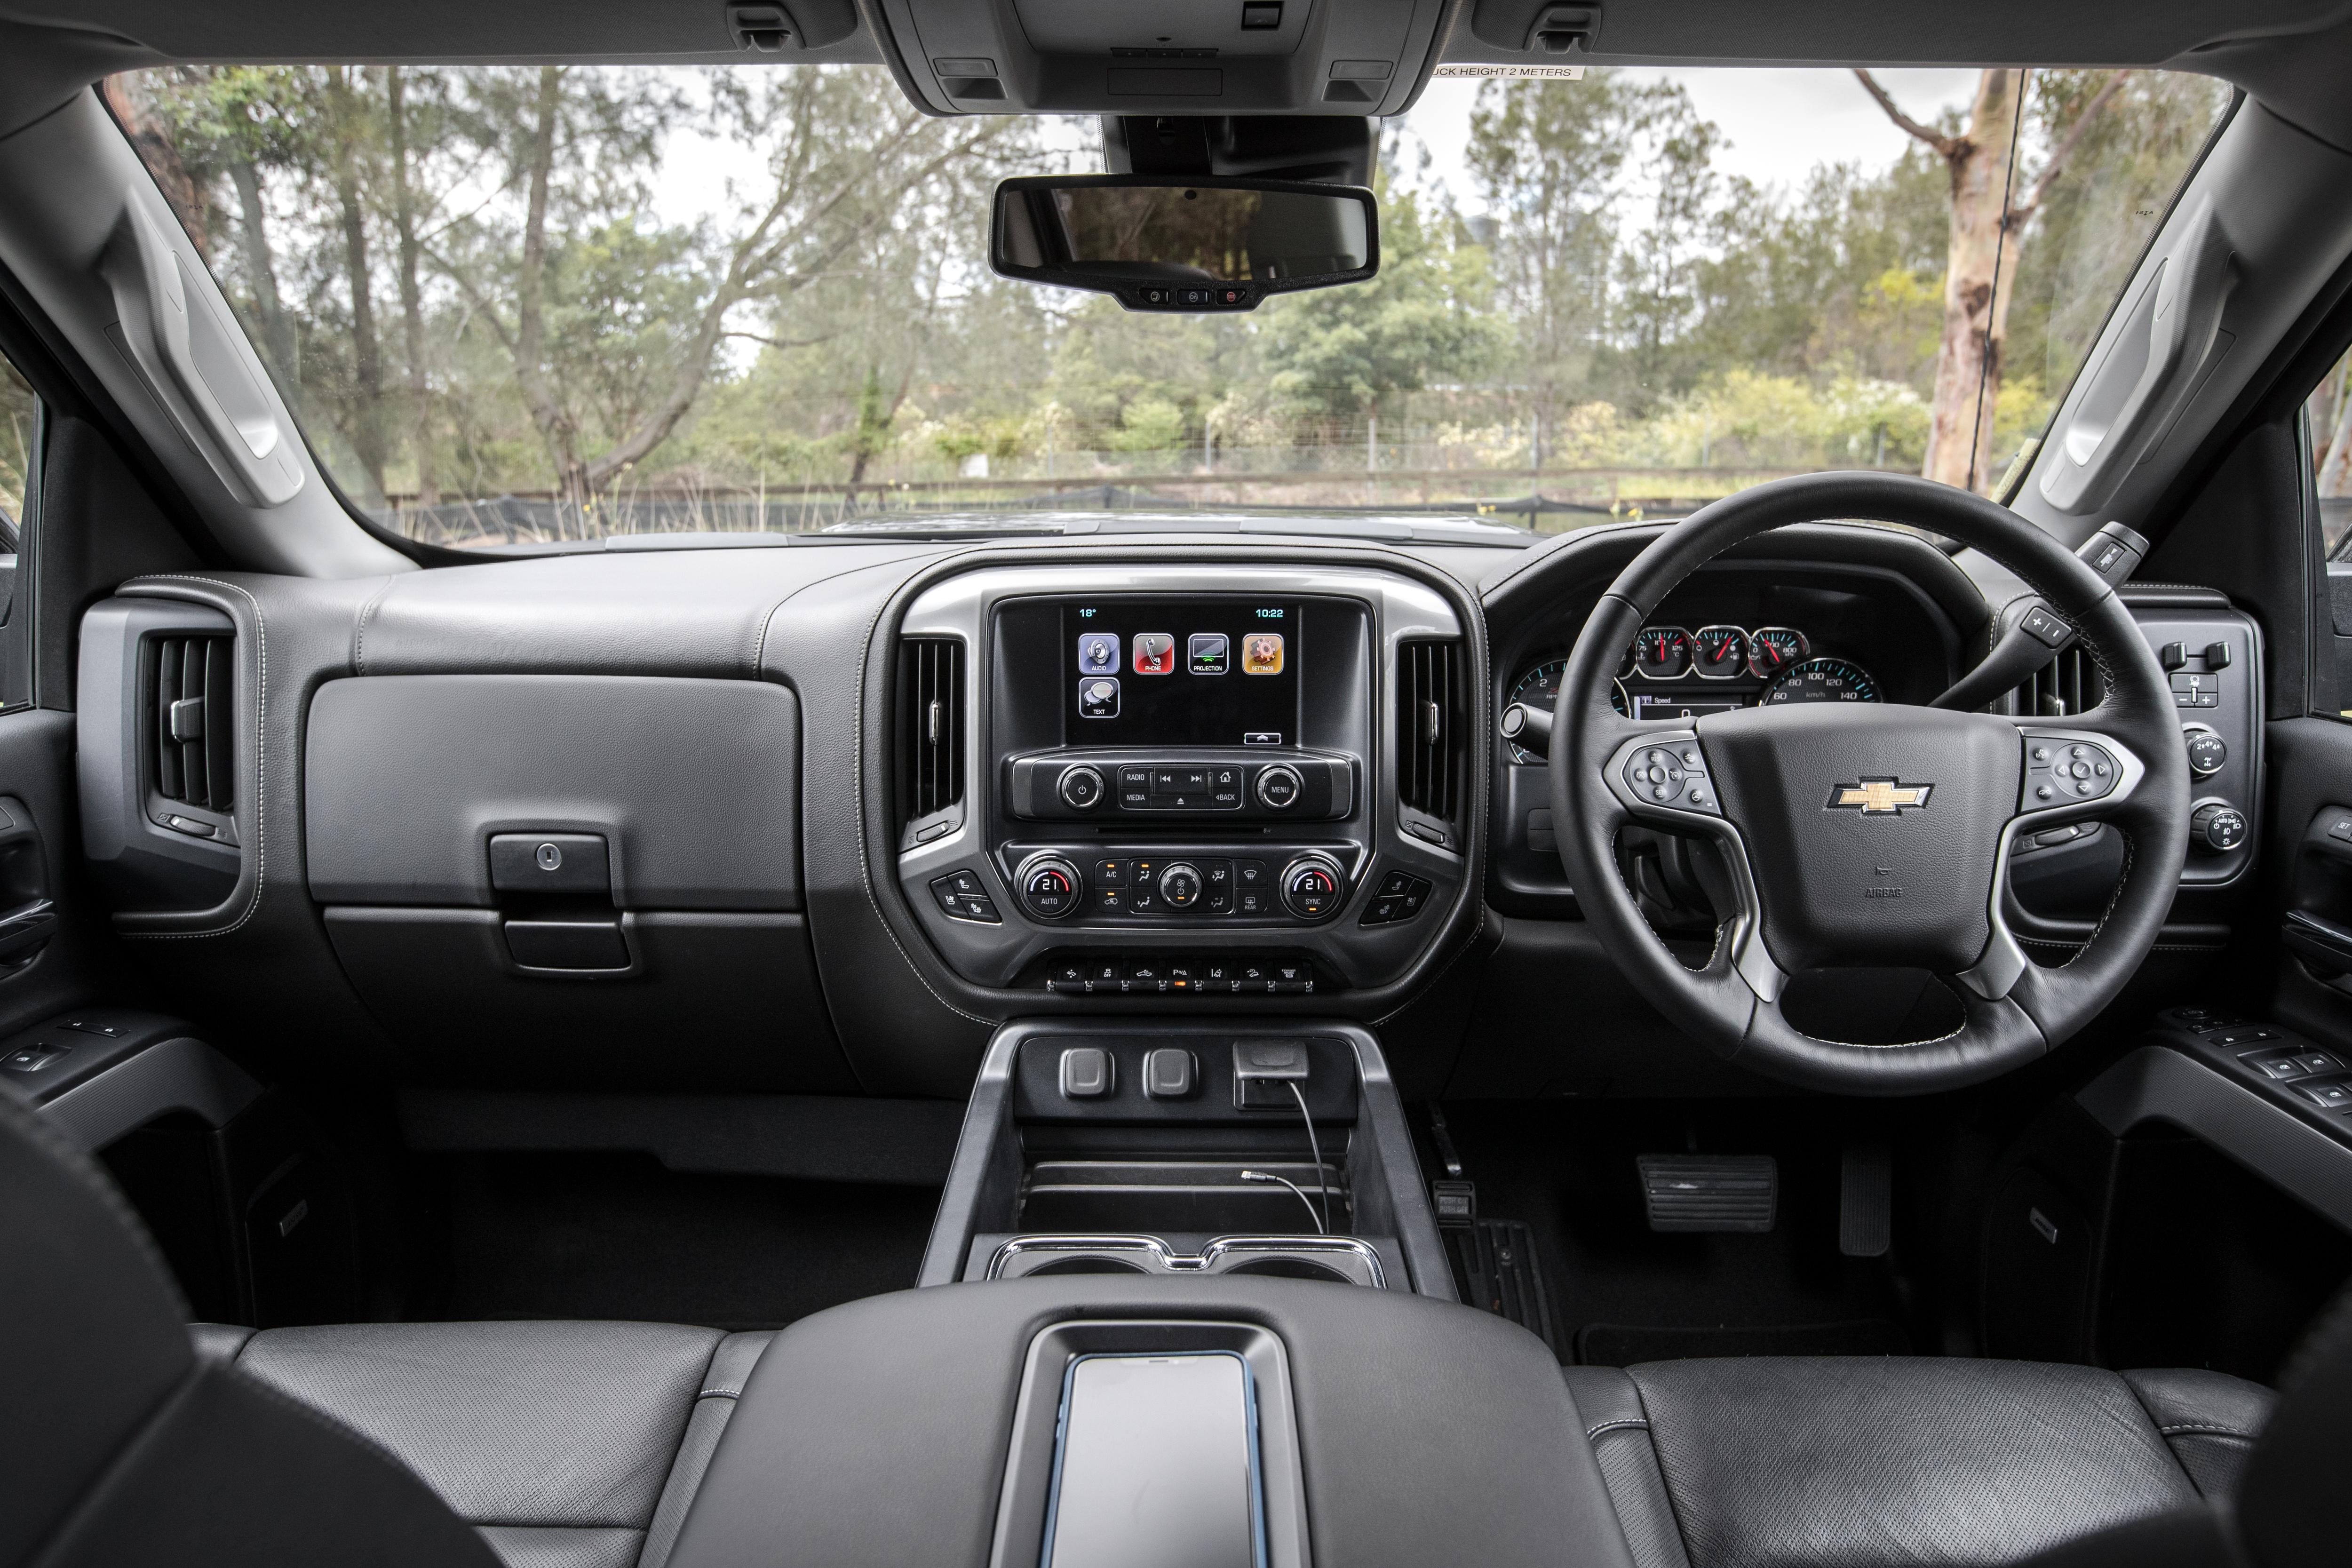 2019 Chevrolet Silverado 2500 LTZ Midnight Edition review